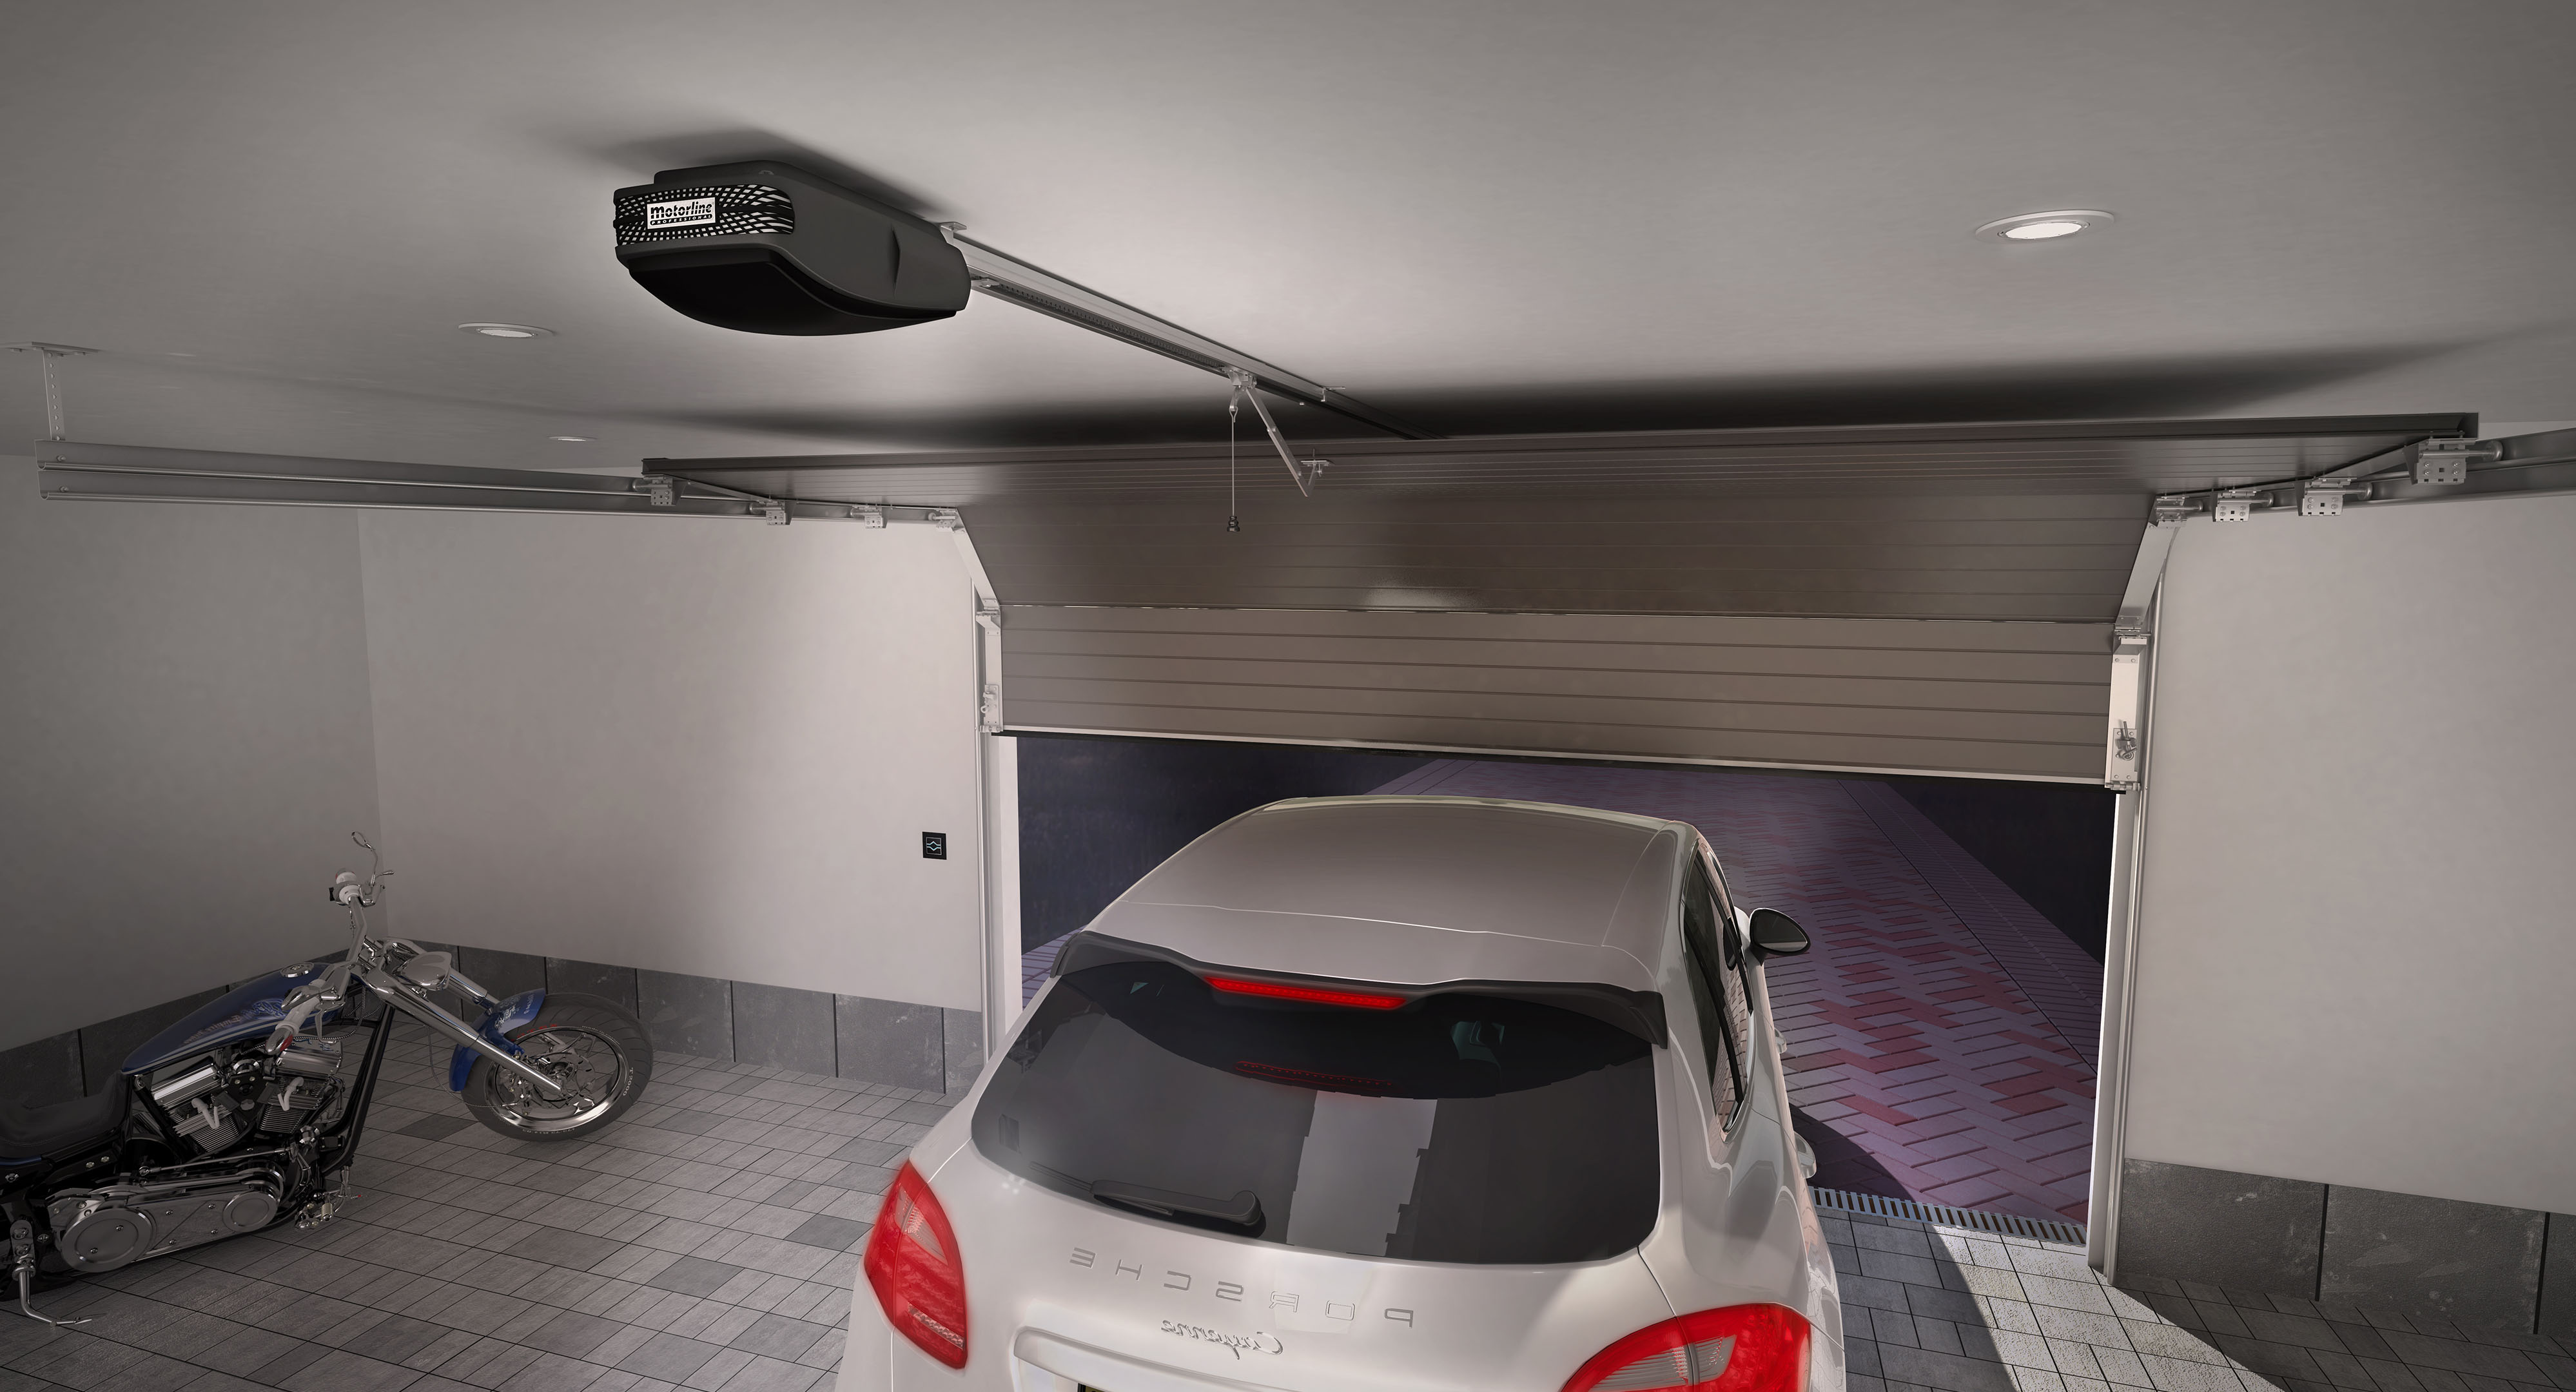 Motorline rosso evo 120 kit puerta seccional instalmatic - Motor puerta garaje seccional ...